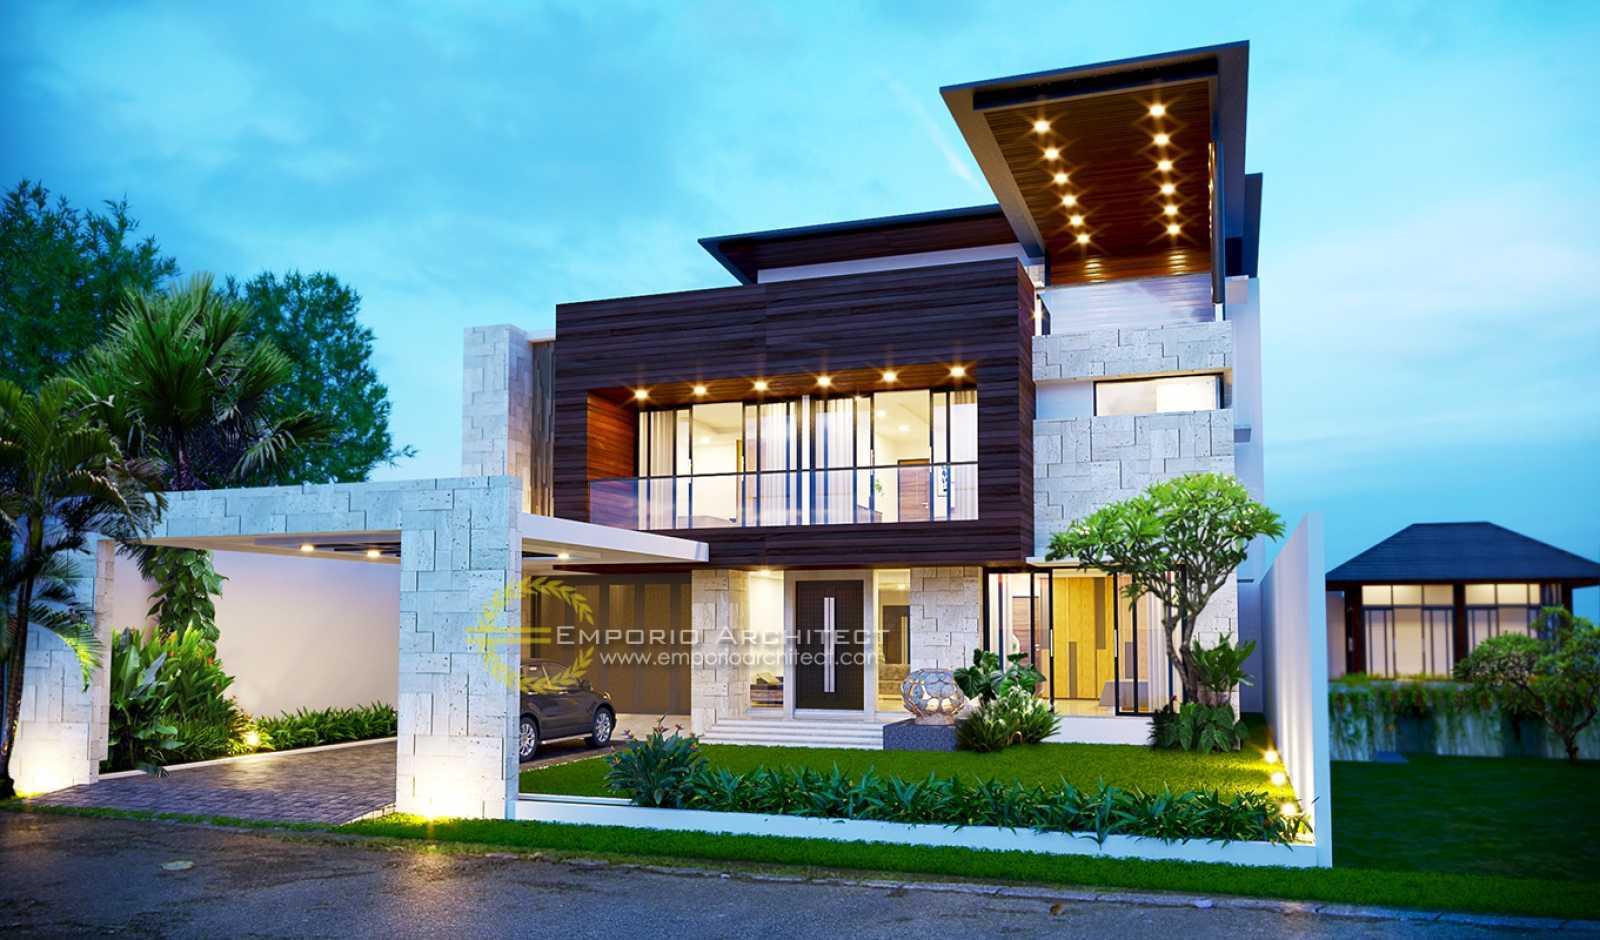 Emporio Architect Jasa Arsitek Cikarang Desain Rumah Modern Tropis 246 @ Cikarang, Bekasi Cikarang, Bekasi, Jawa Barat, Indonesia Cikarang, Bekasi, Jawa Barat, Indonesia Emporio-Architect-Jasa-Arsitek-Cikarang-Desain-Rumah-Modern-Tropis-246-Cikarang-Bekasi Modern  80725